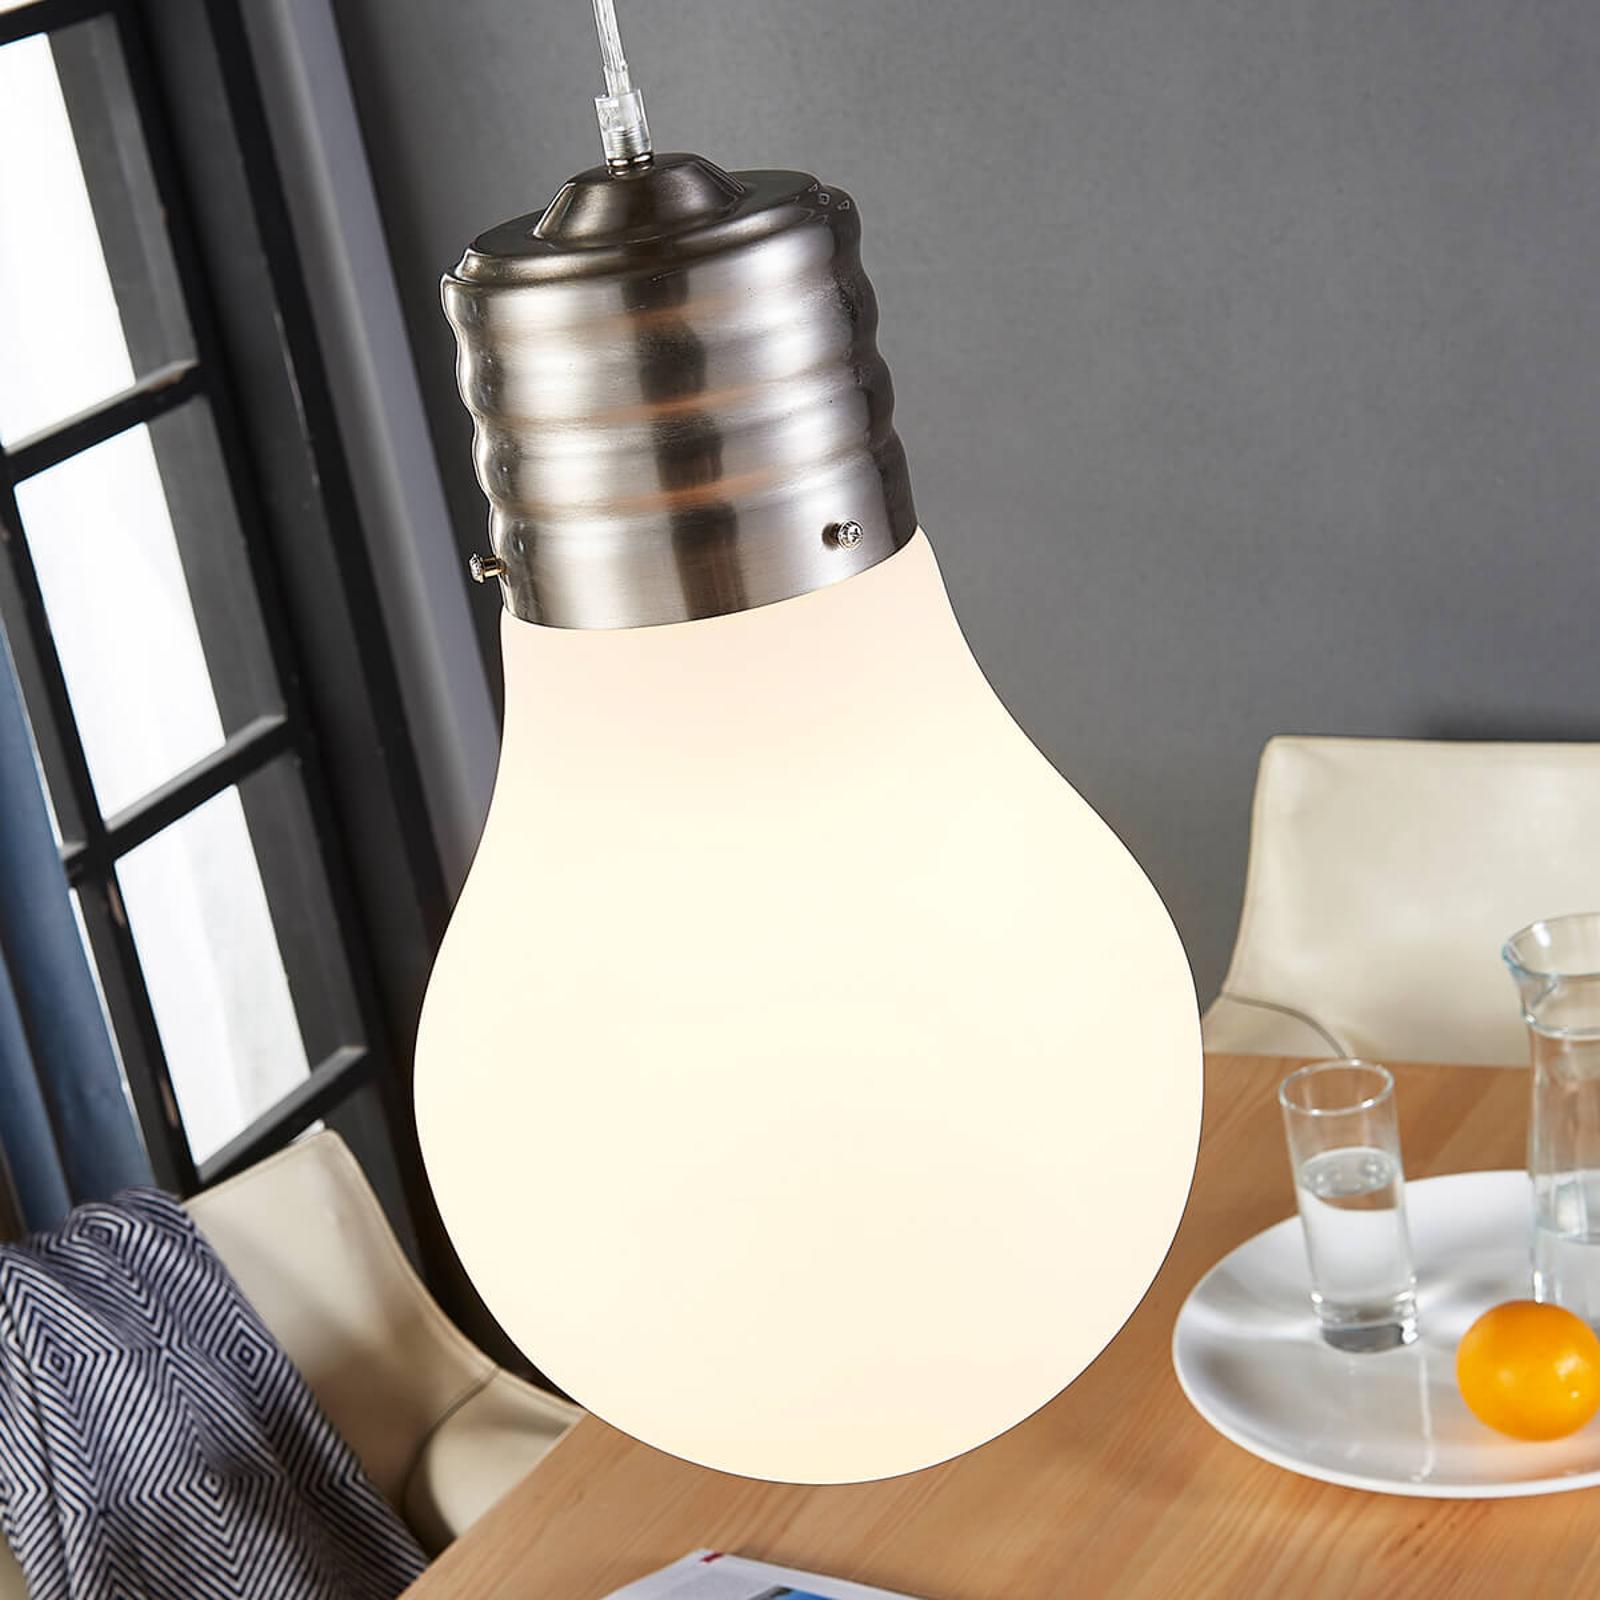 Dimbar LED-pendellampe Bado med glødepæreform